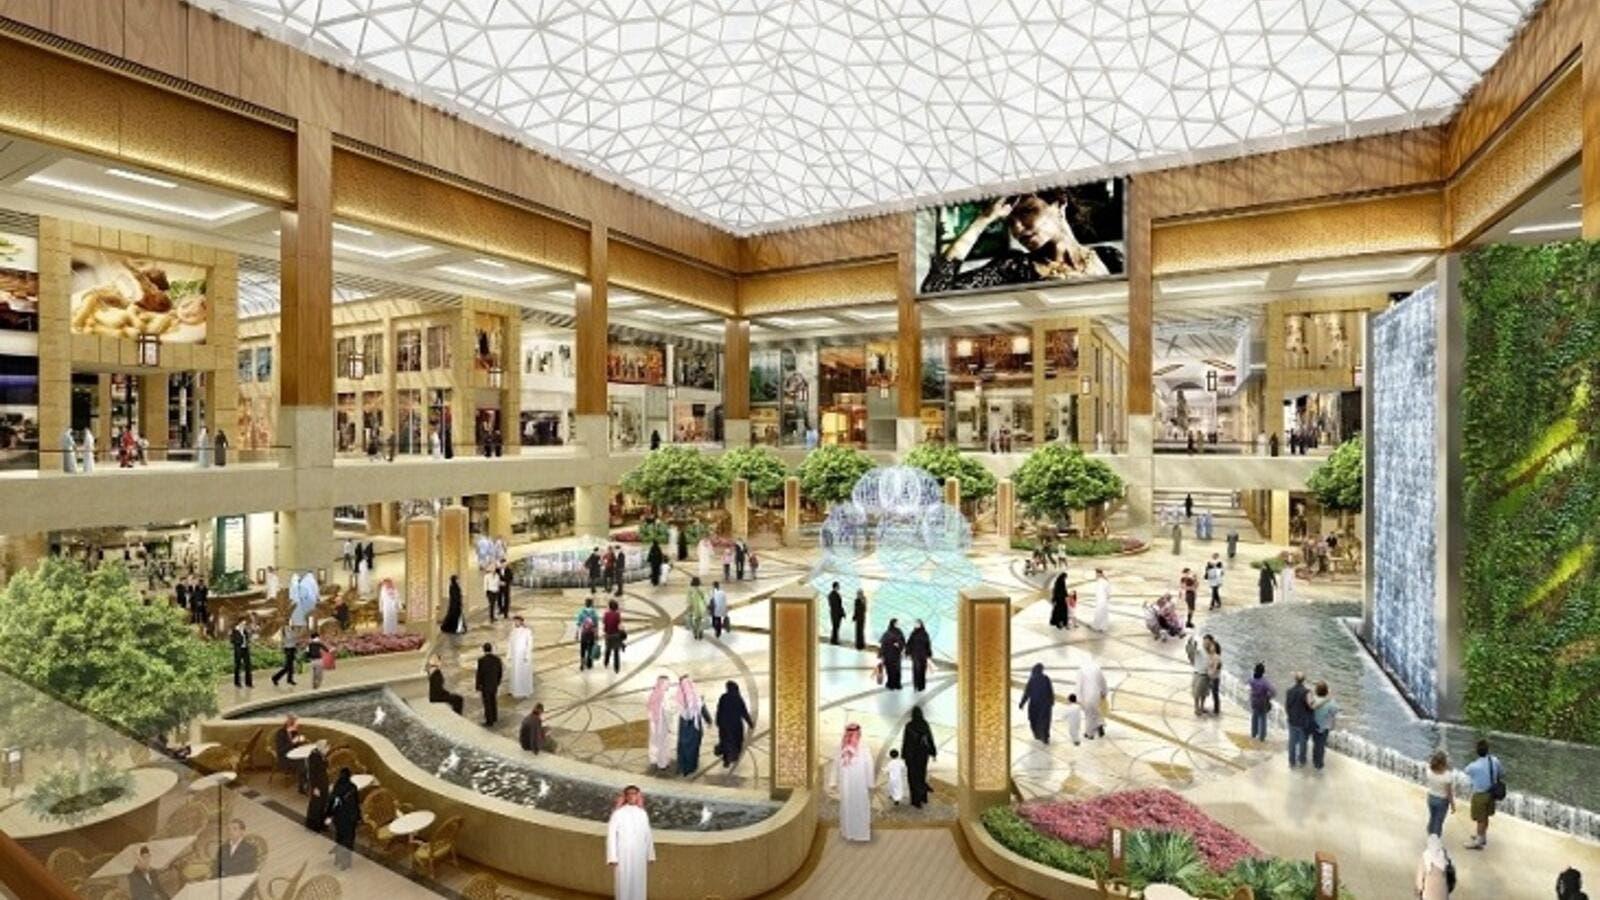 Oversupply of retail space in Abu Dhabi pushes rental prices